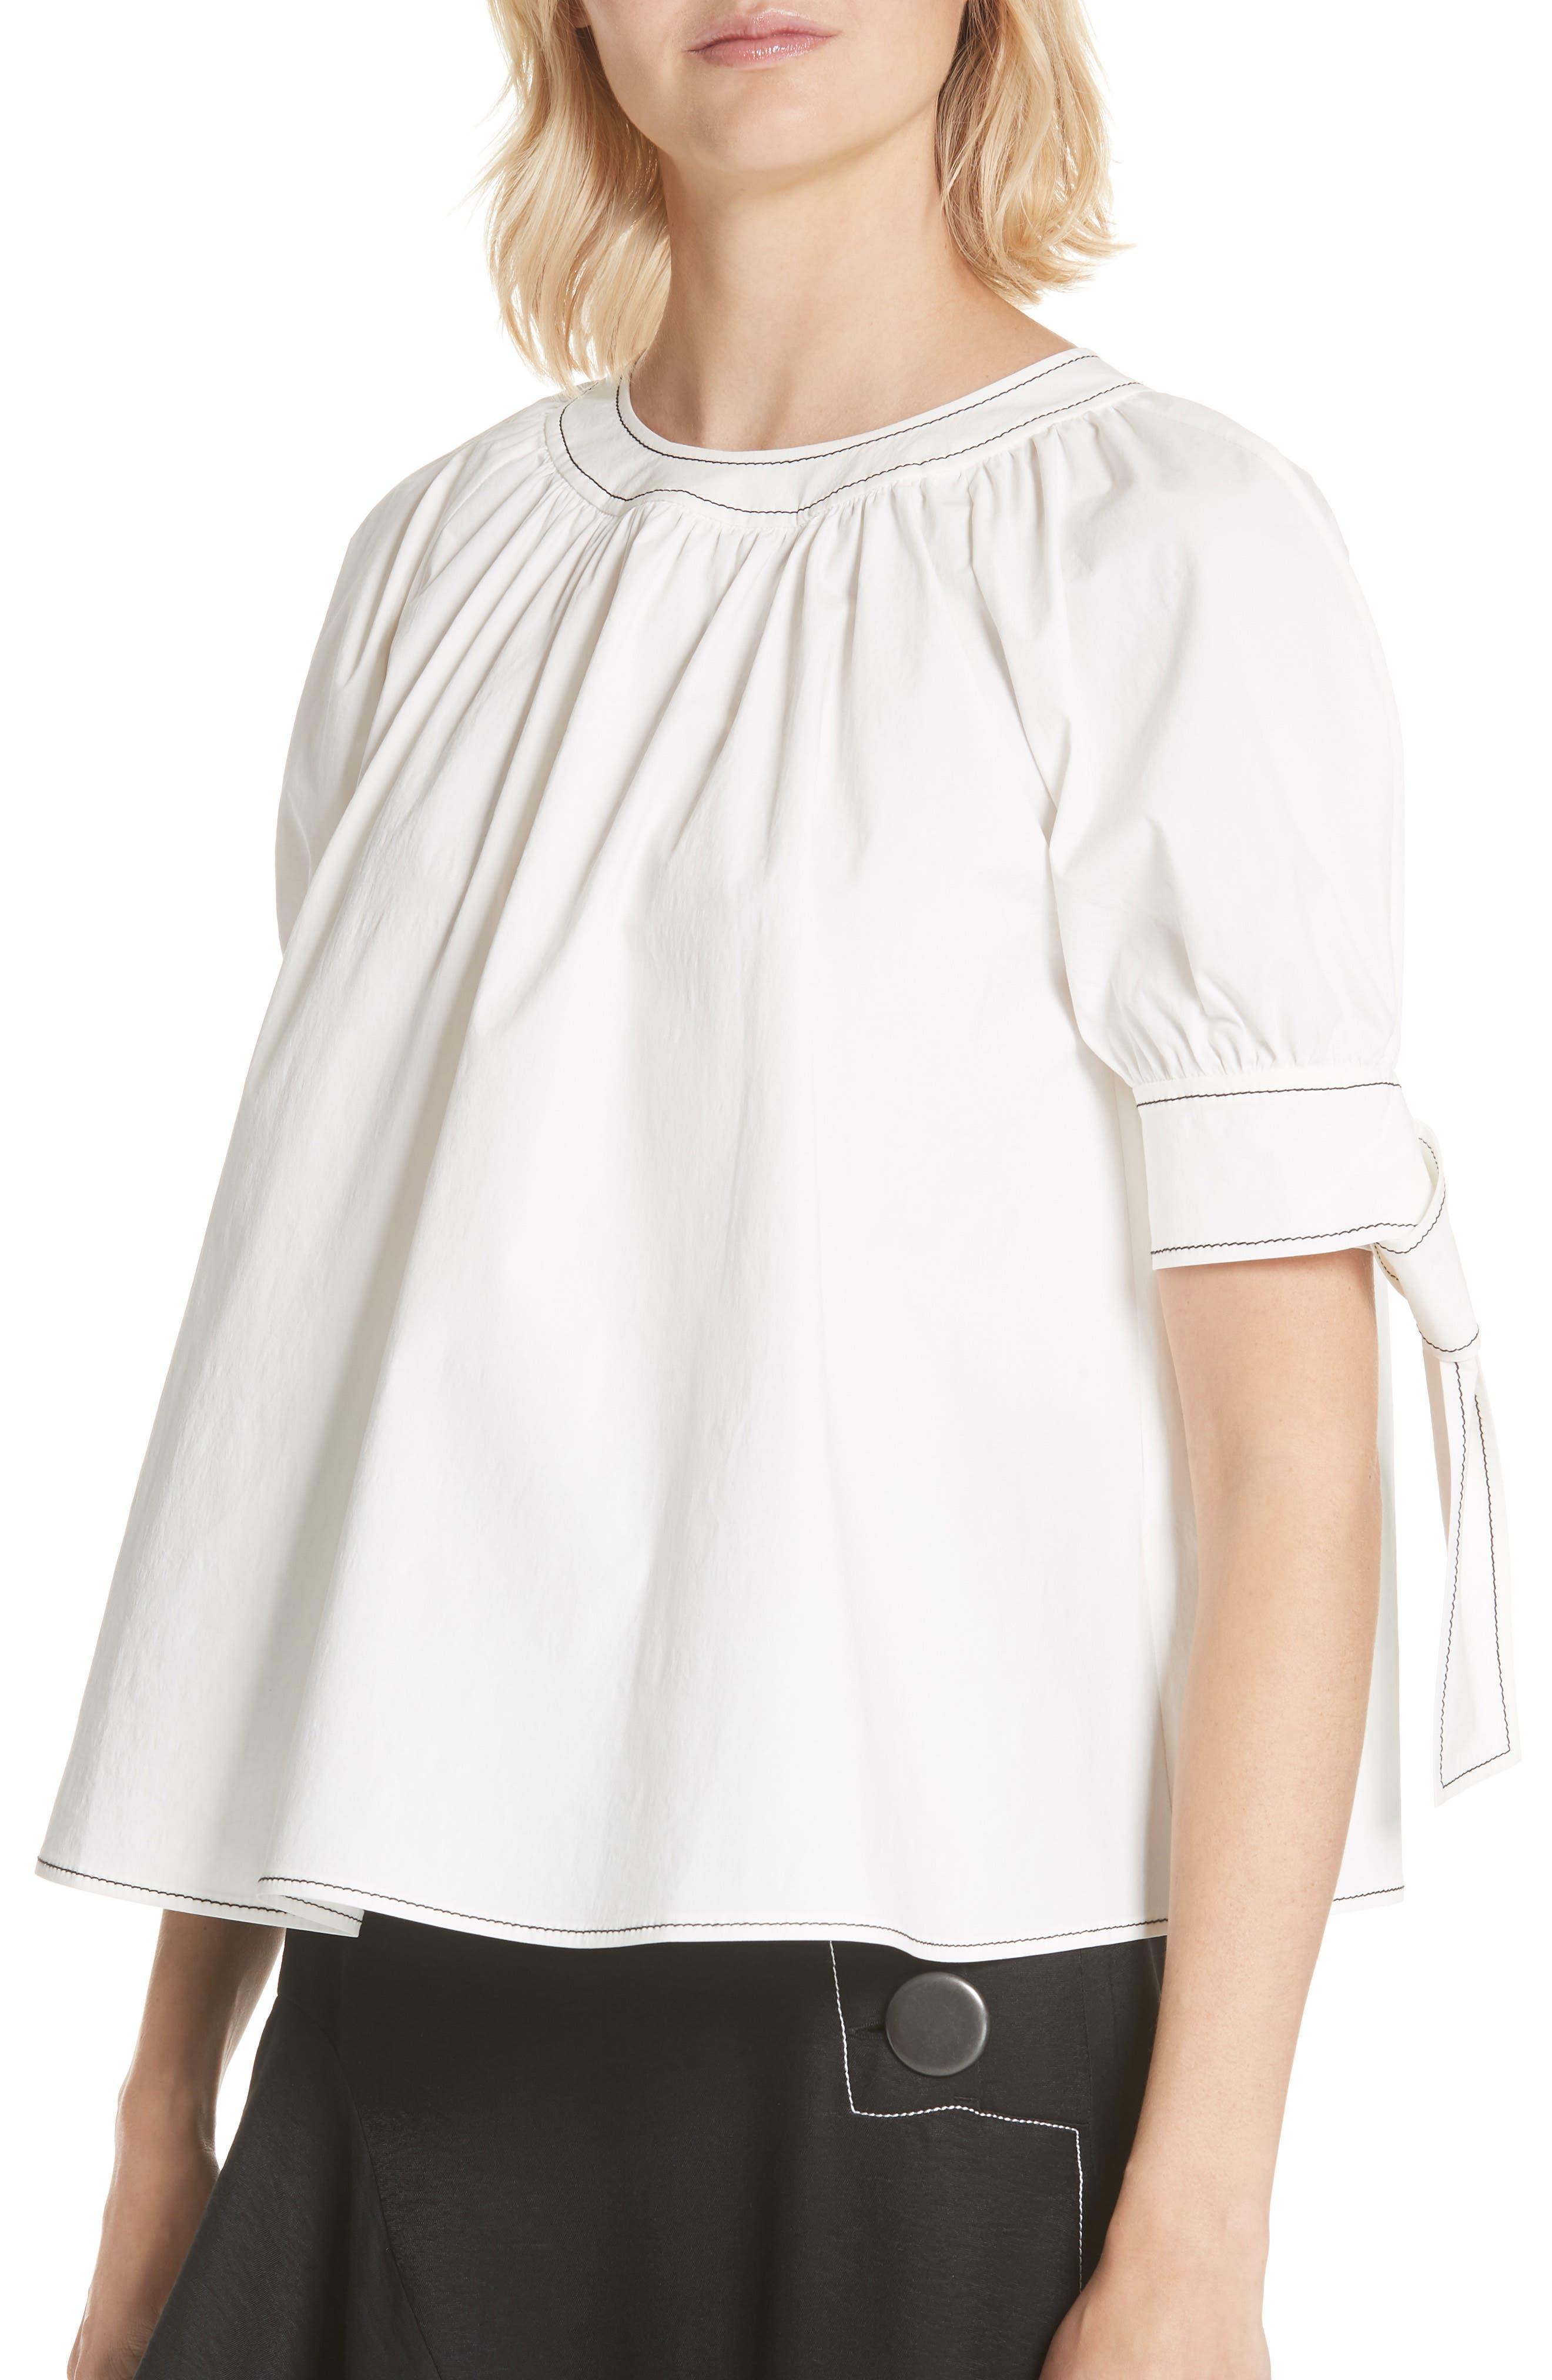 Hailey Short Sleeve Blouse Top,                             Alternate thumbnail 4, color,                             100